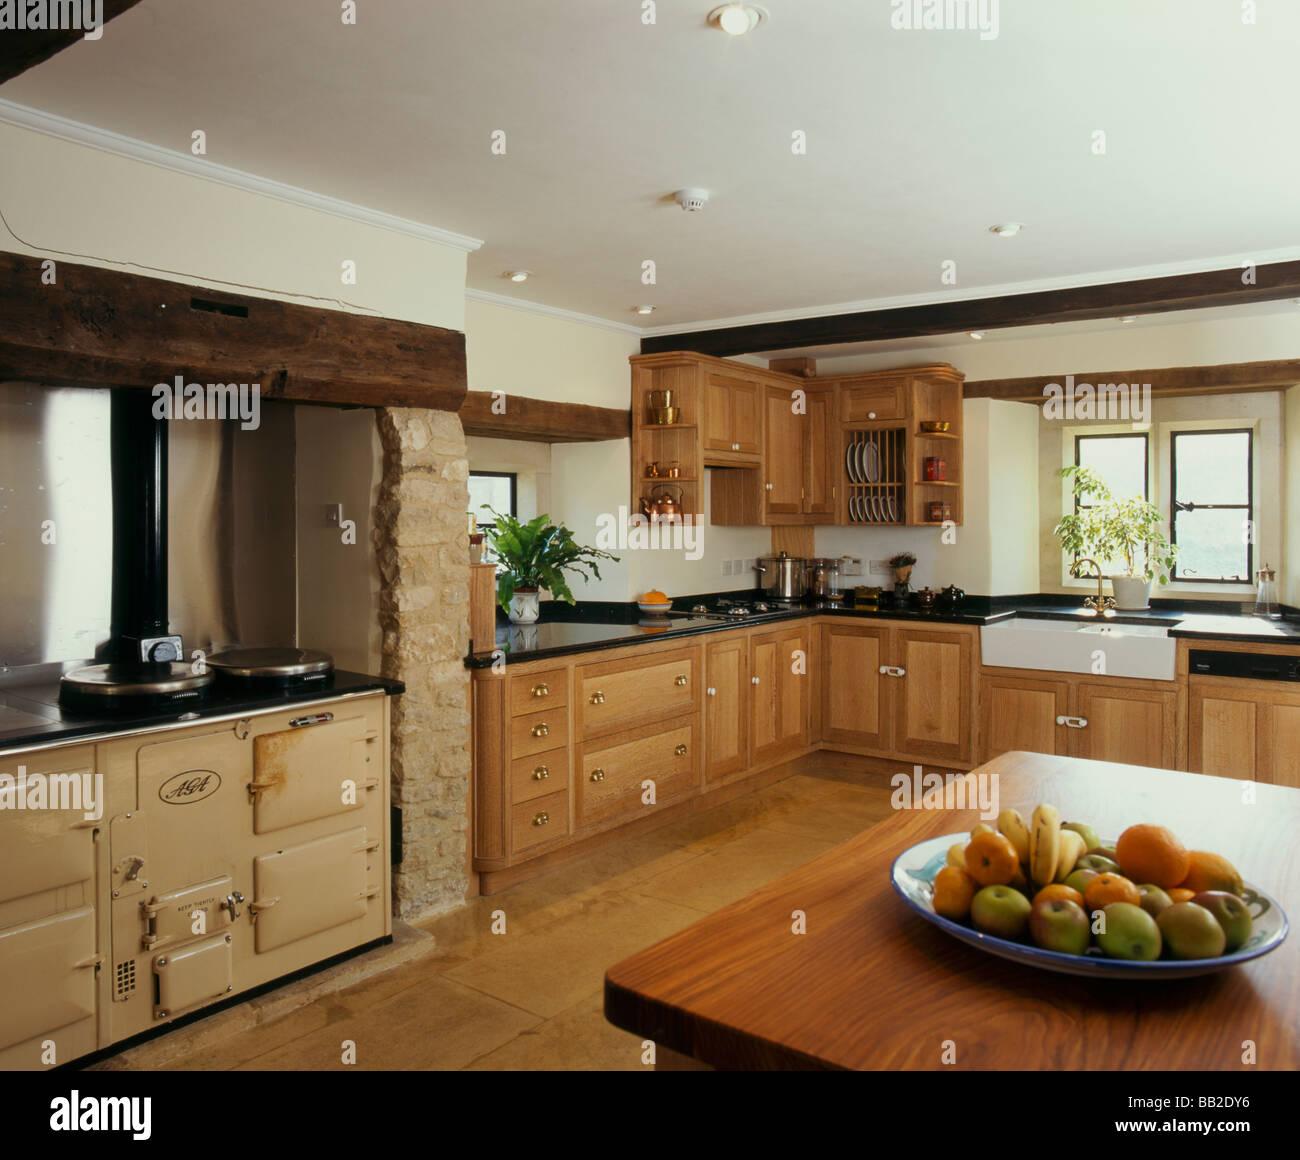 UK Kitchen Dining Room Stock Photo Royalty Free Image 24026442